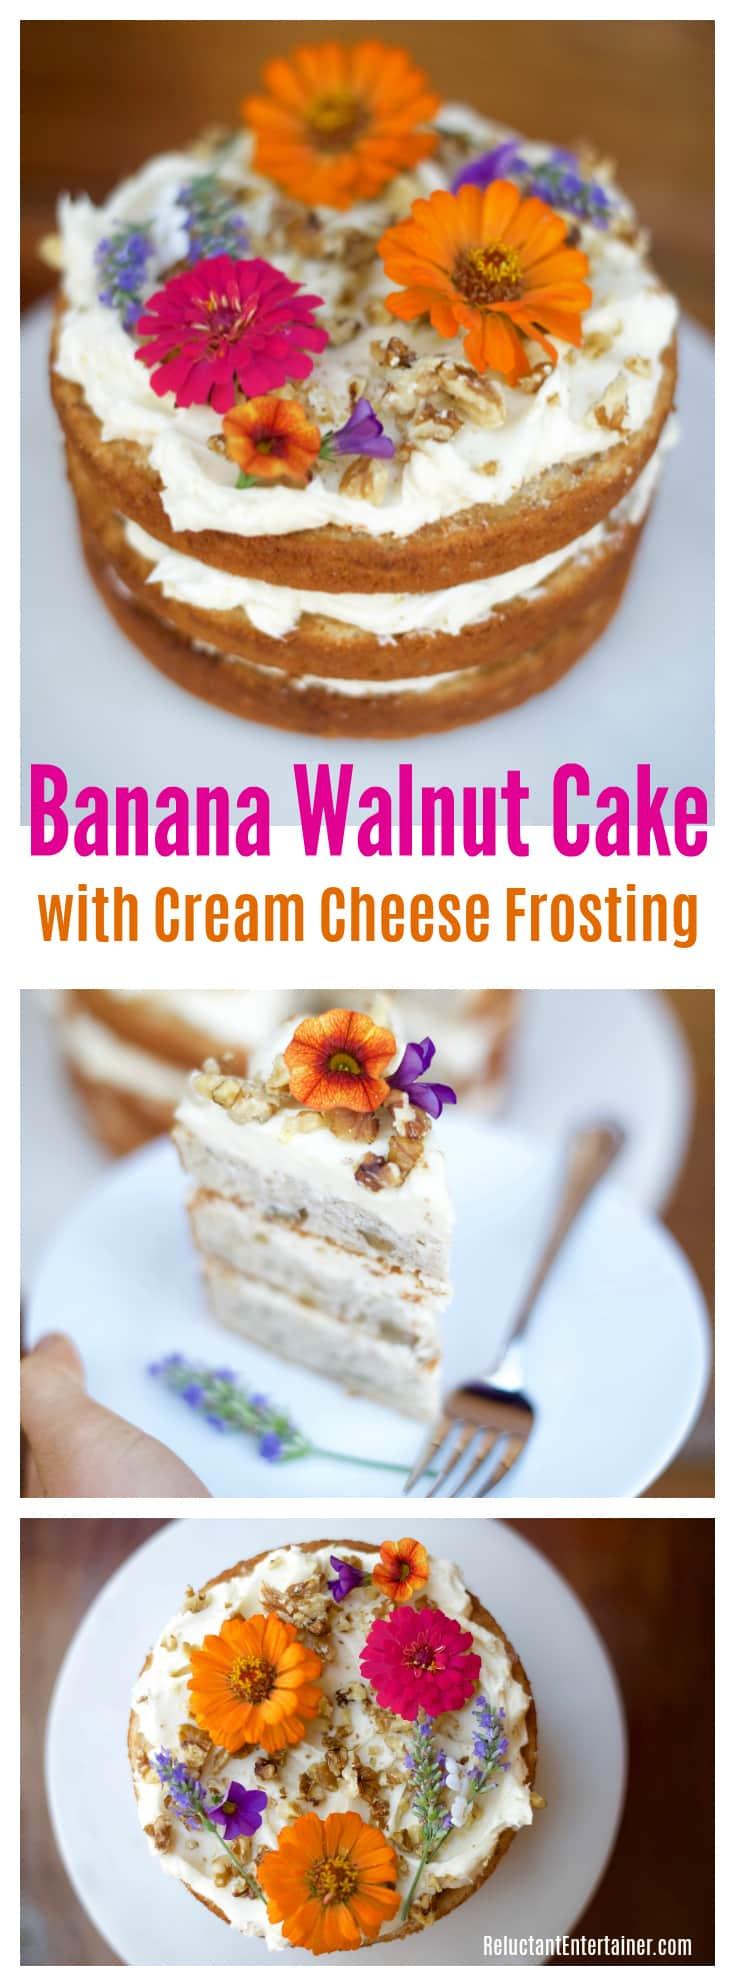 Banana Walnut Cake with Cream Cheese Frosting Recipe